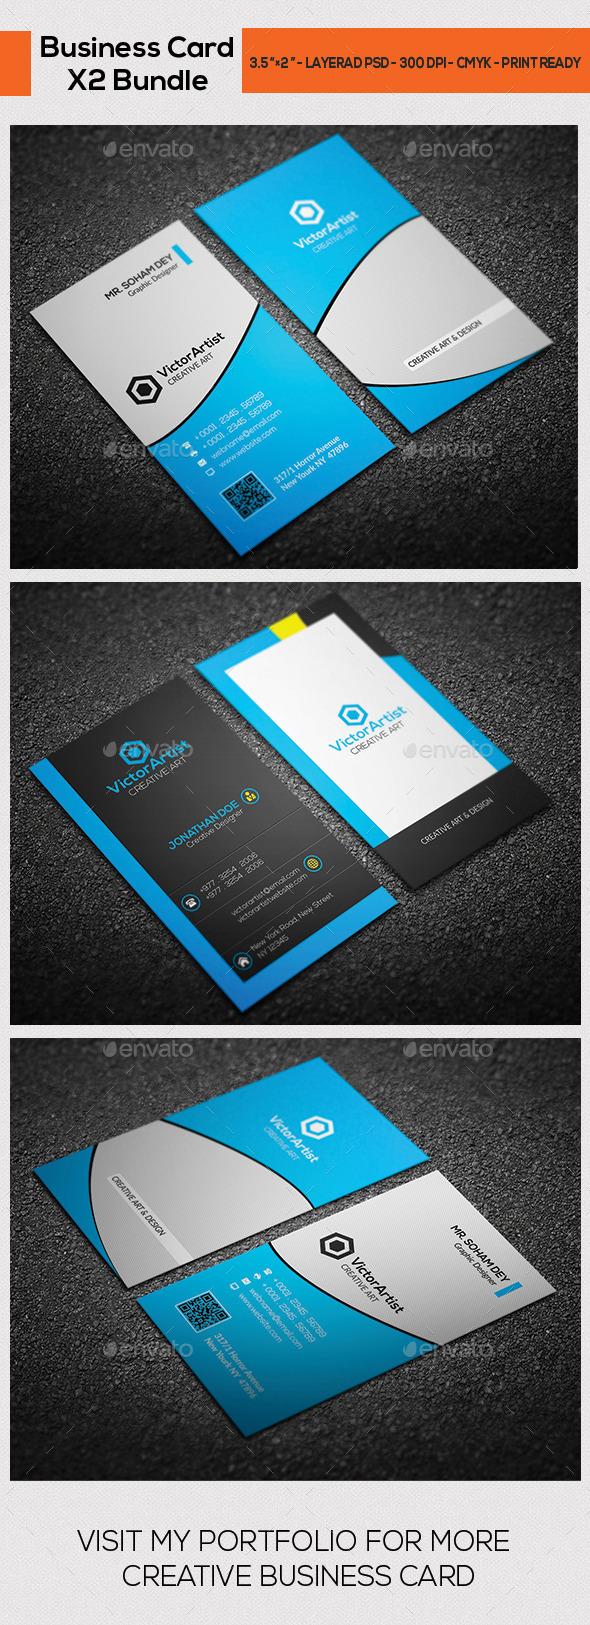 X2 Creative Business Card Bundle 03 - Corporate Business Cards